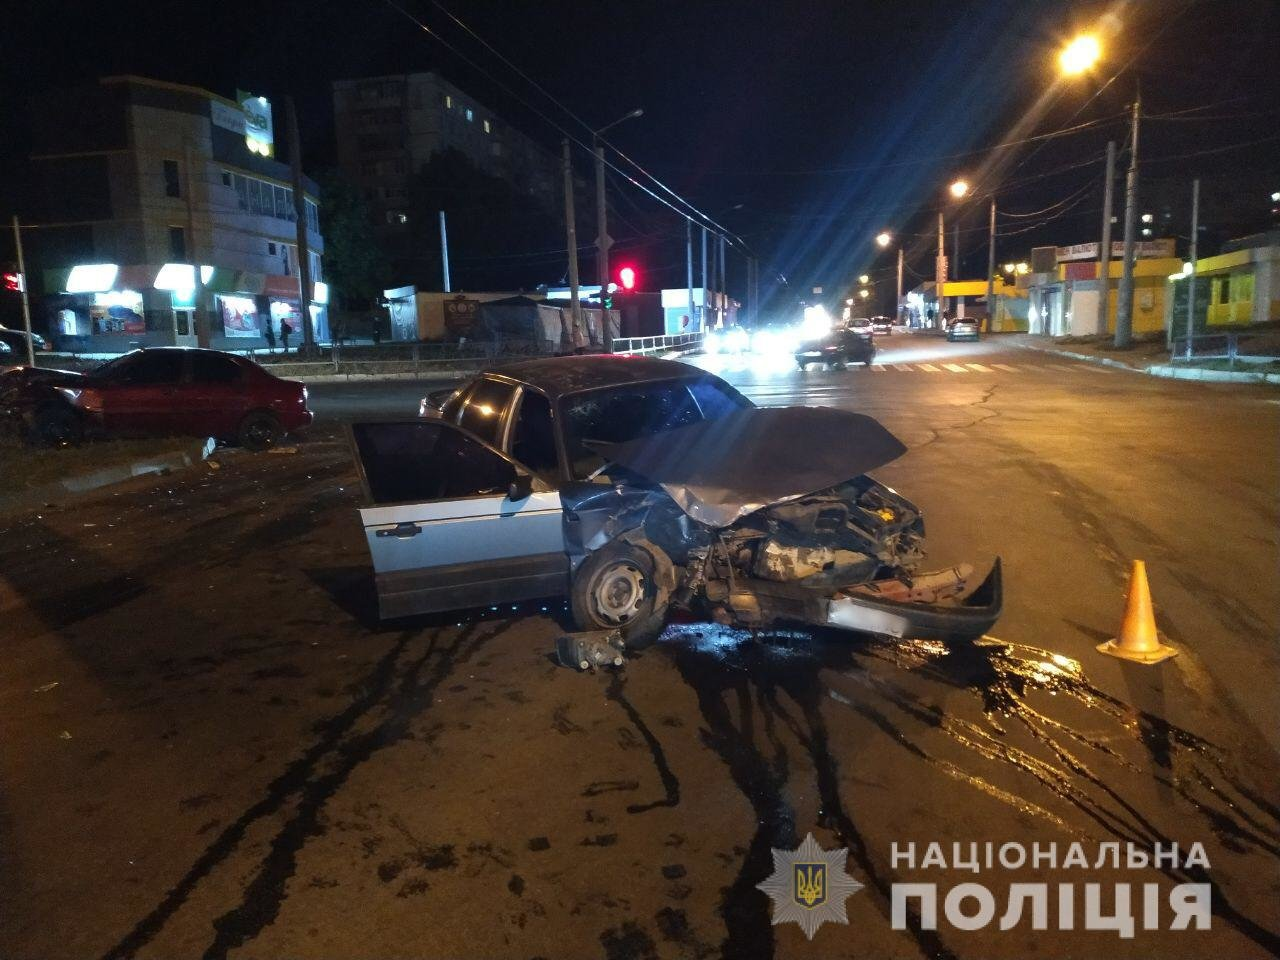 ДТП на Салтовке с пострадавшими: полиция устанавливает причины аварии, - ФОТО, фото-2